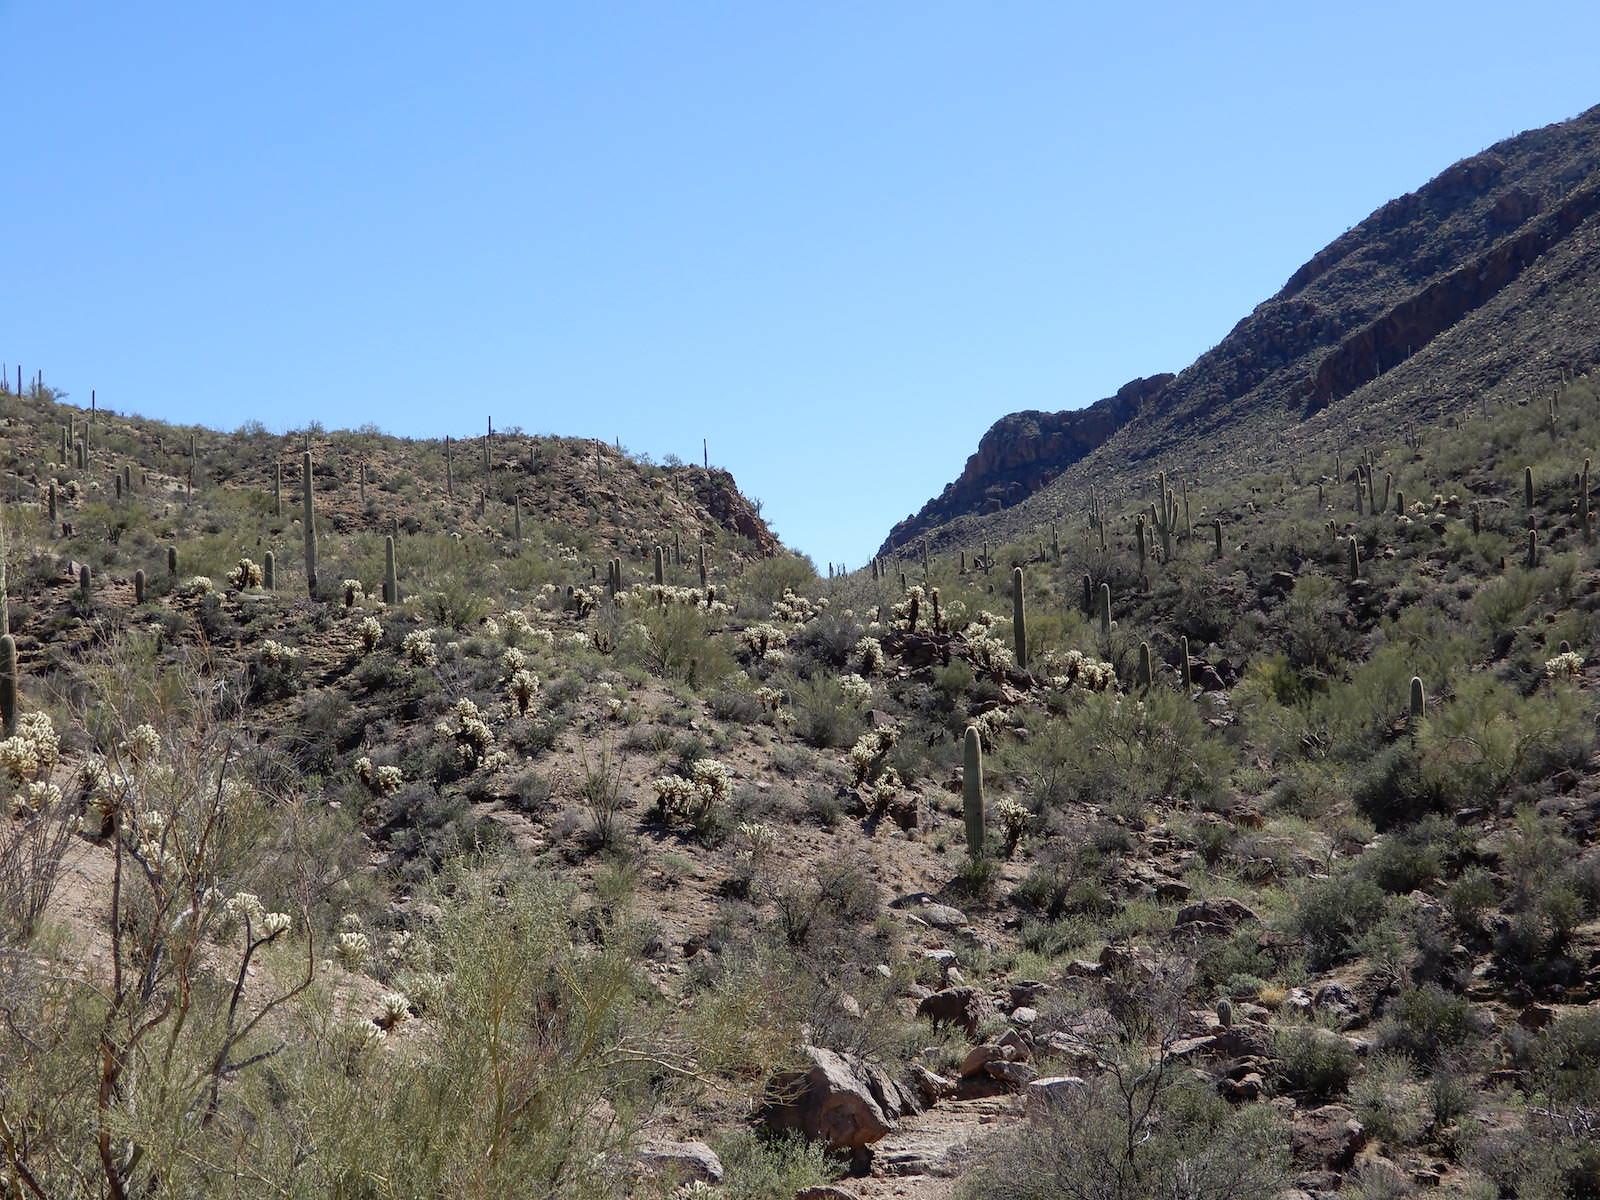 Cactus view - acres in Arizona